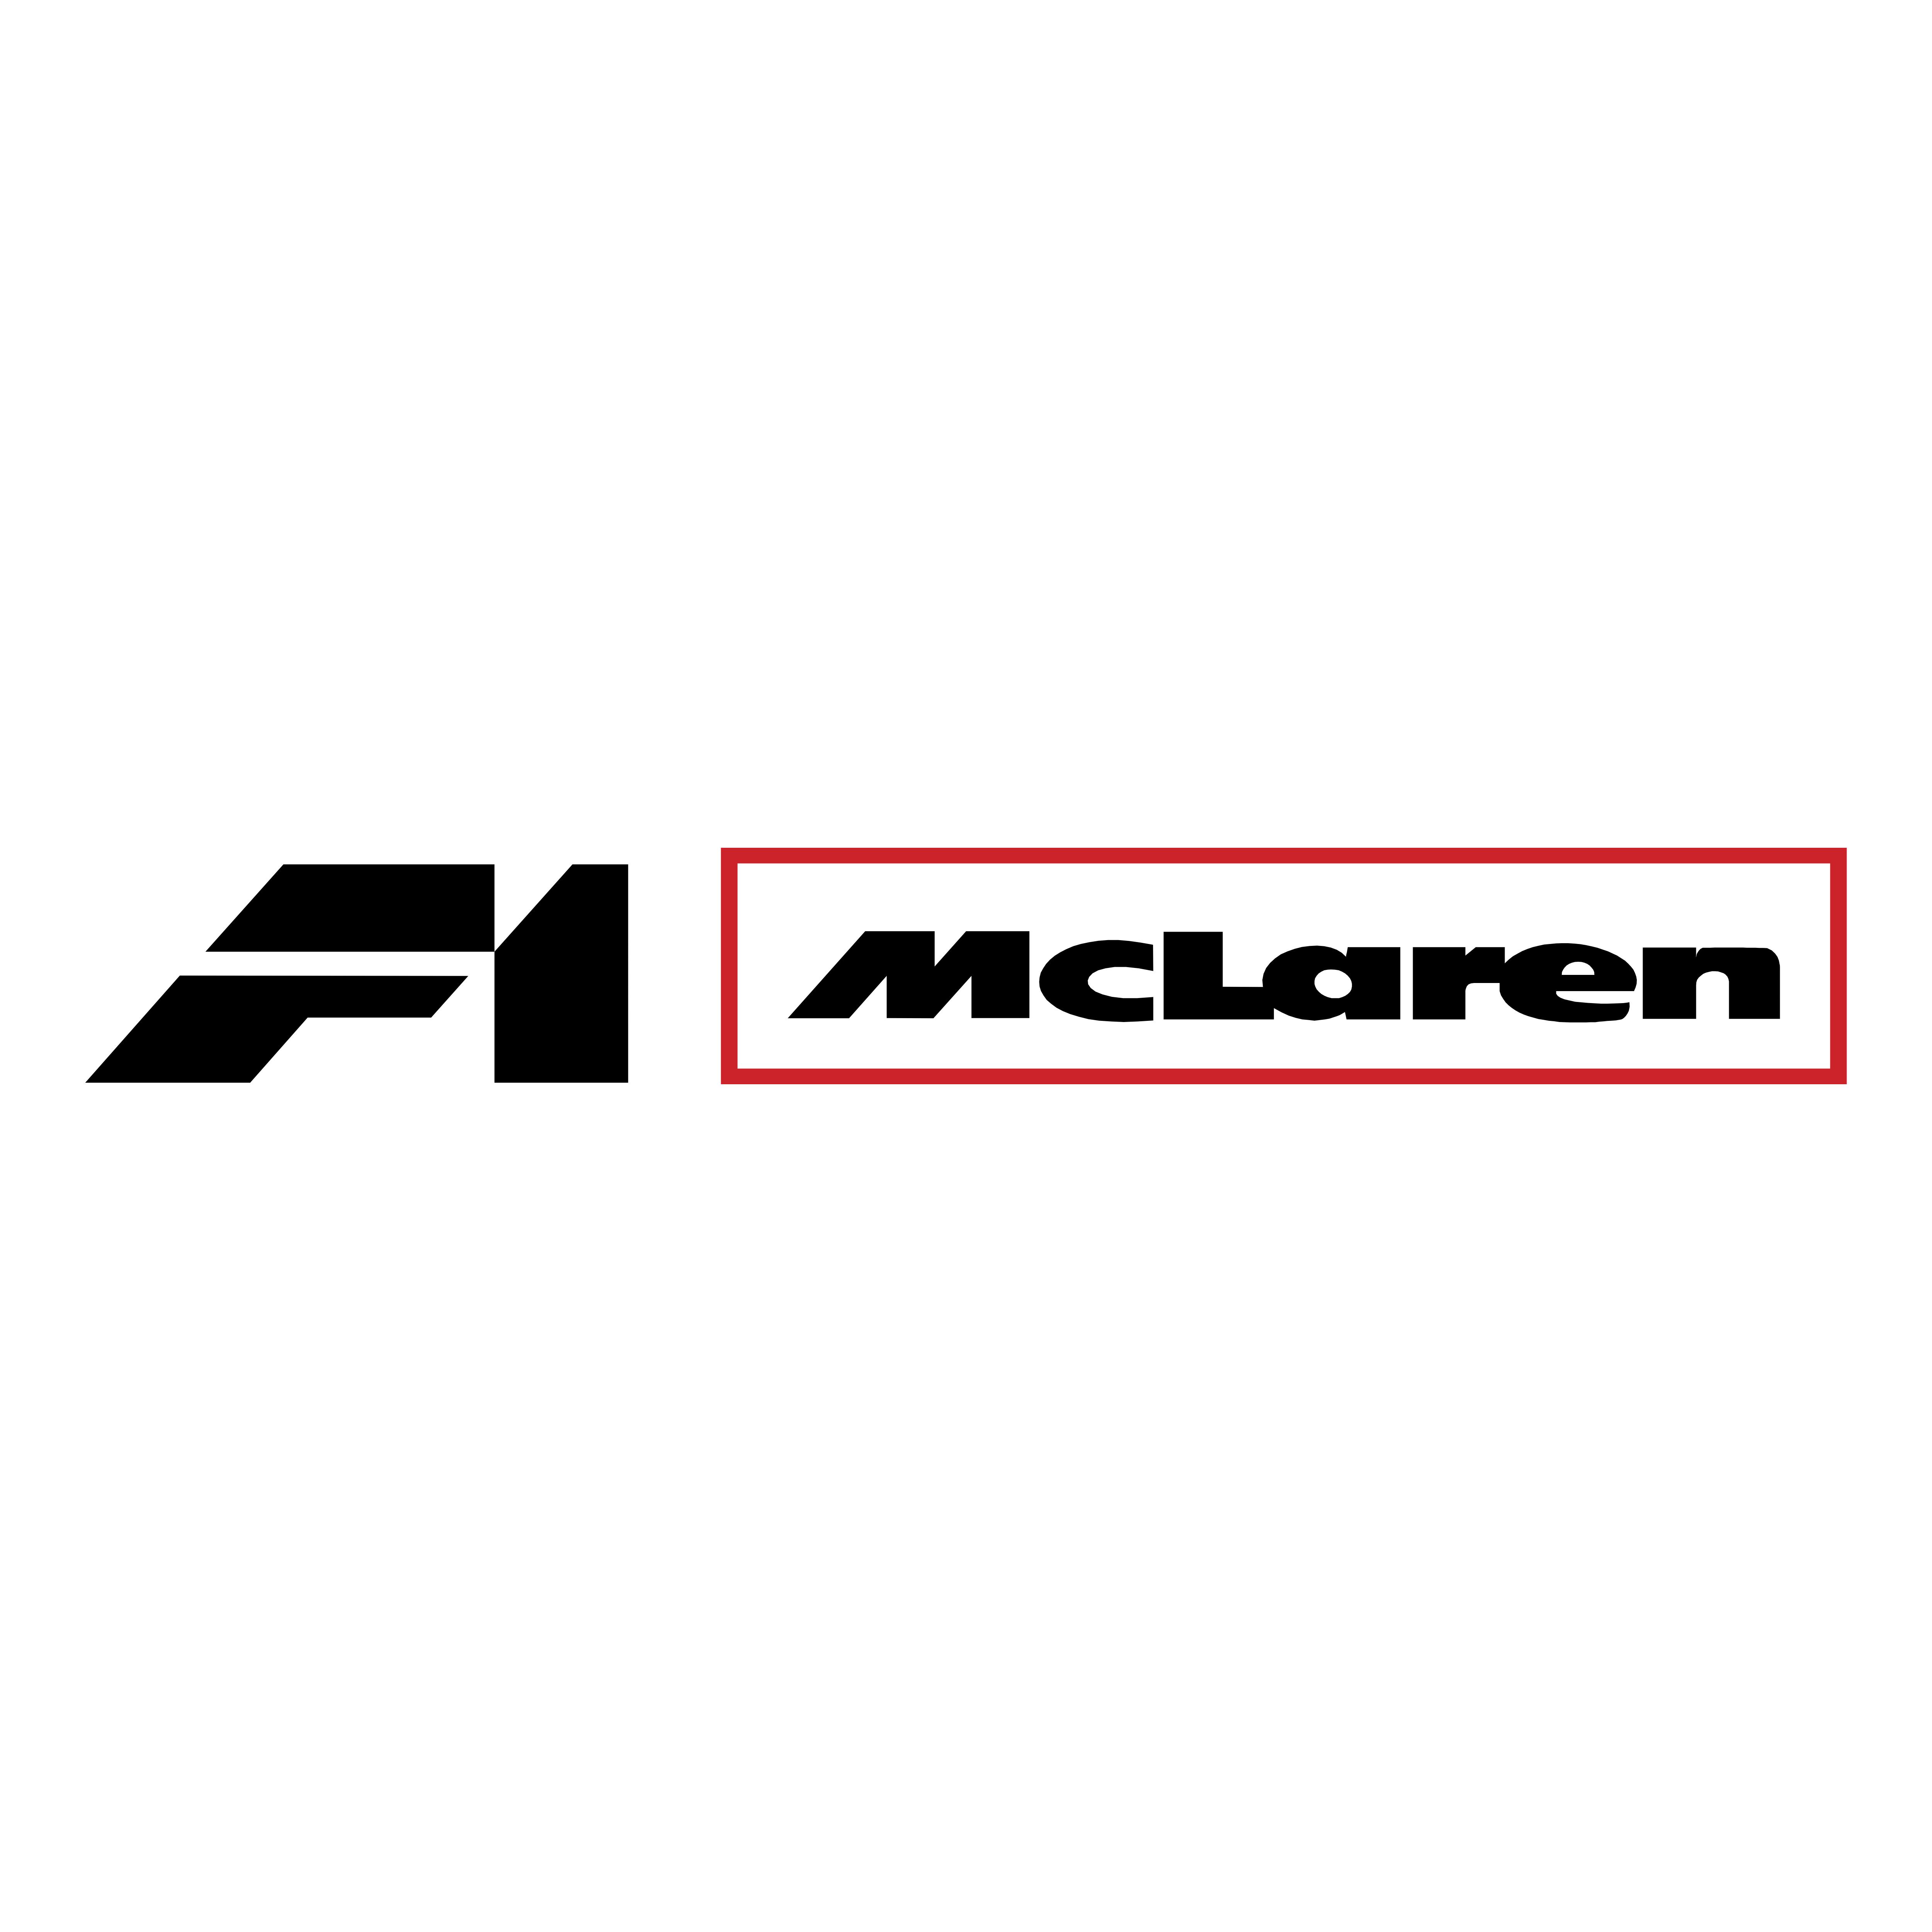 mclaren  u2013 logos download